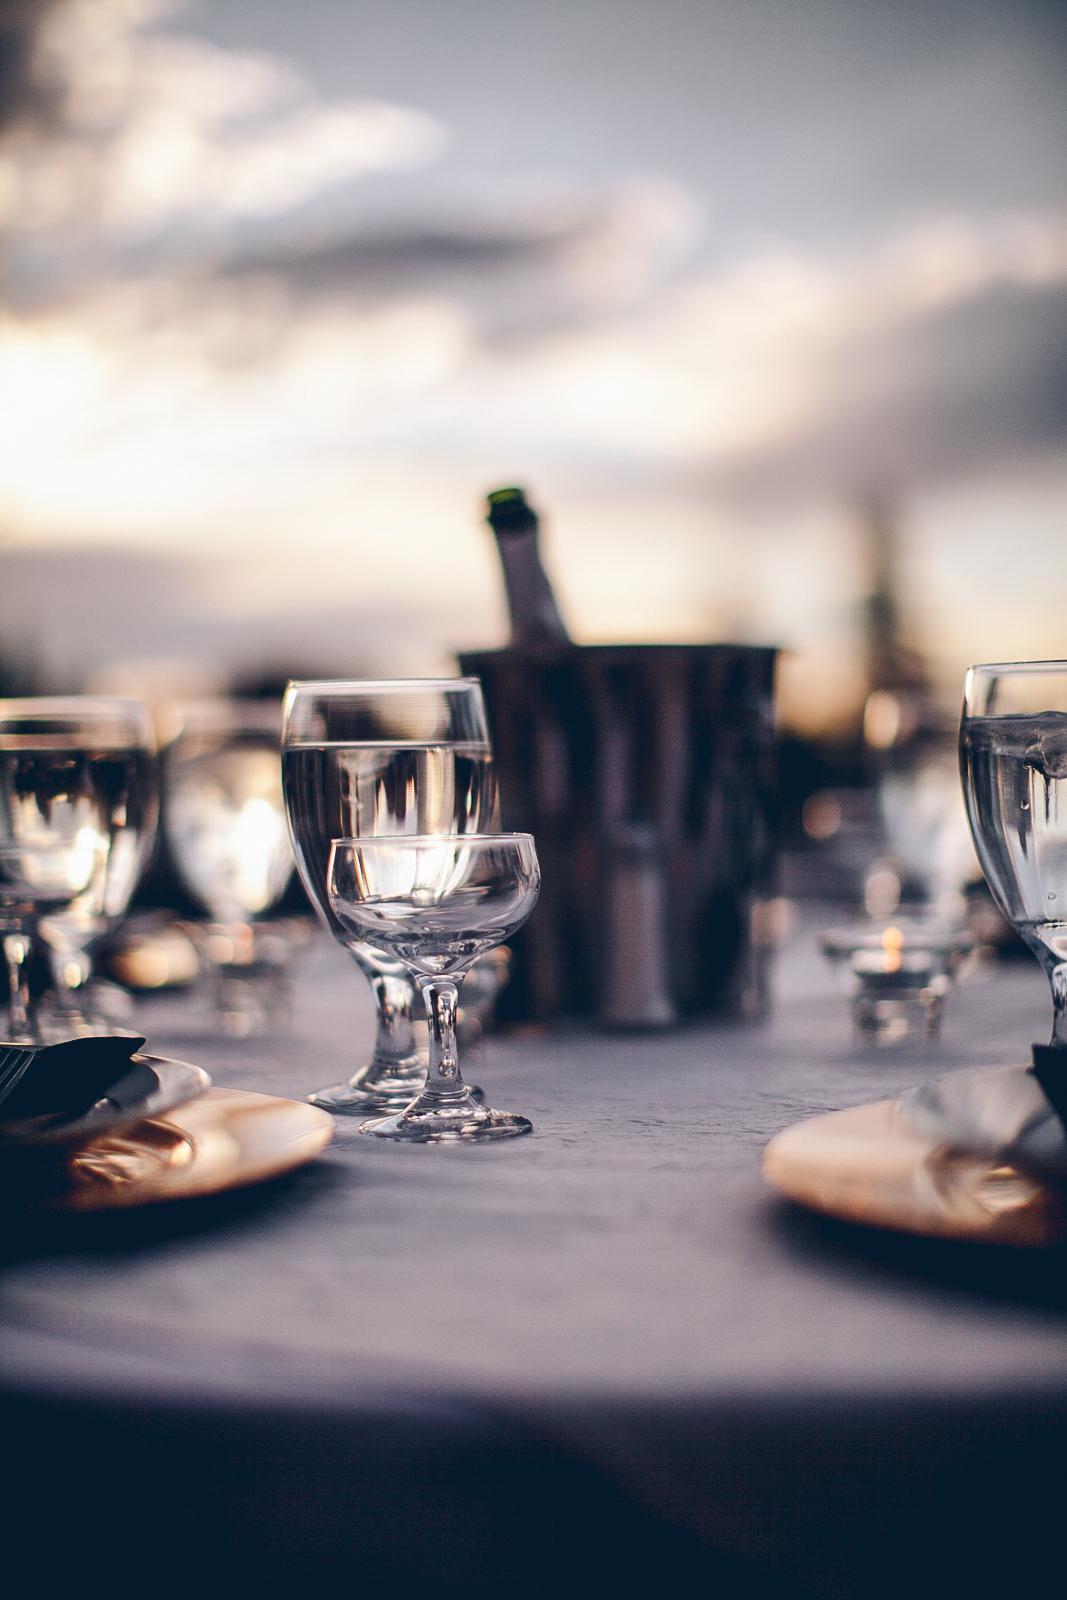 miraflores_winery_wedding_photography_ian_melissa_ebony_siovhan_bokeh_photography_67.jpg